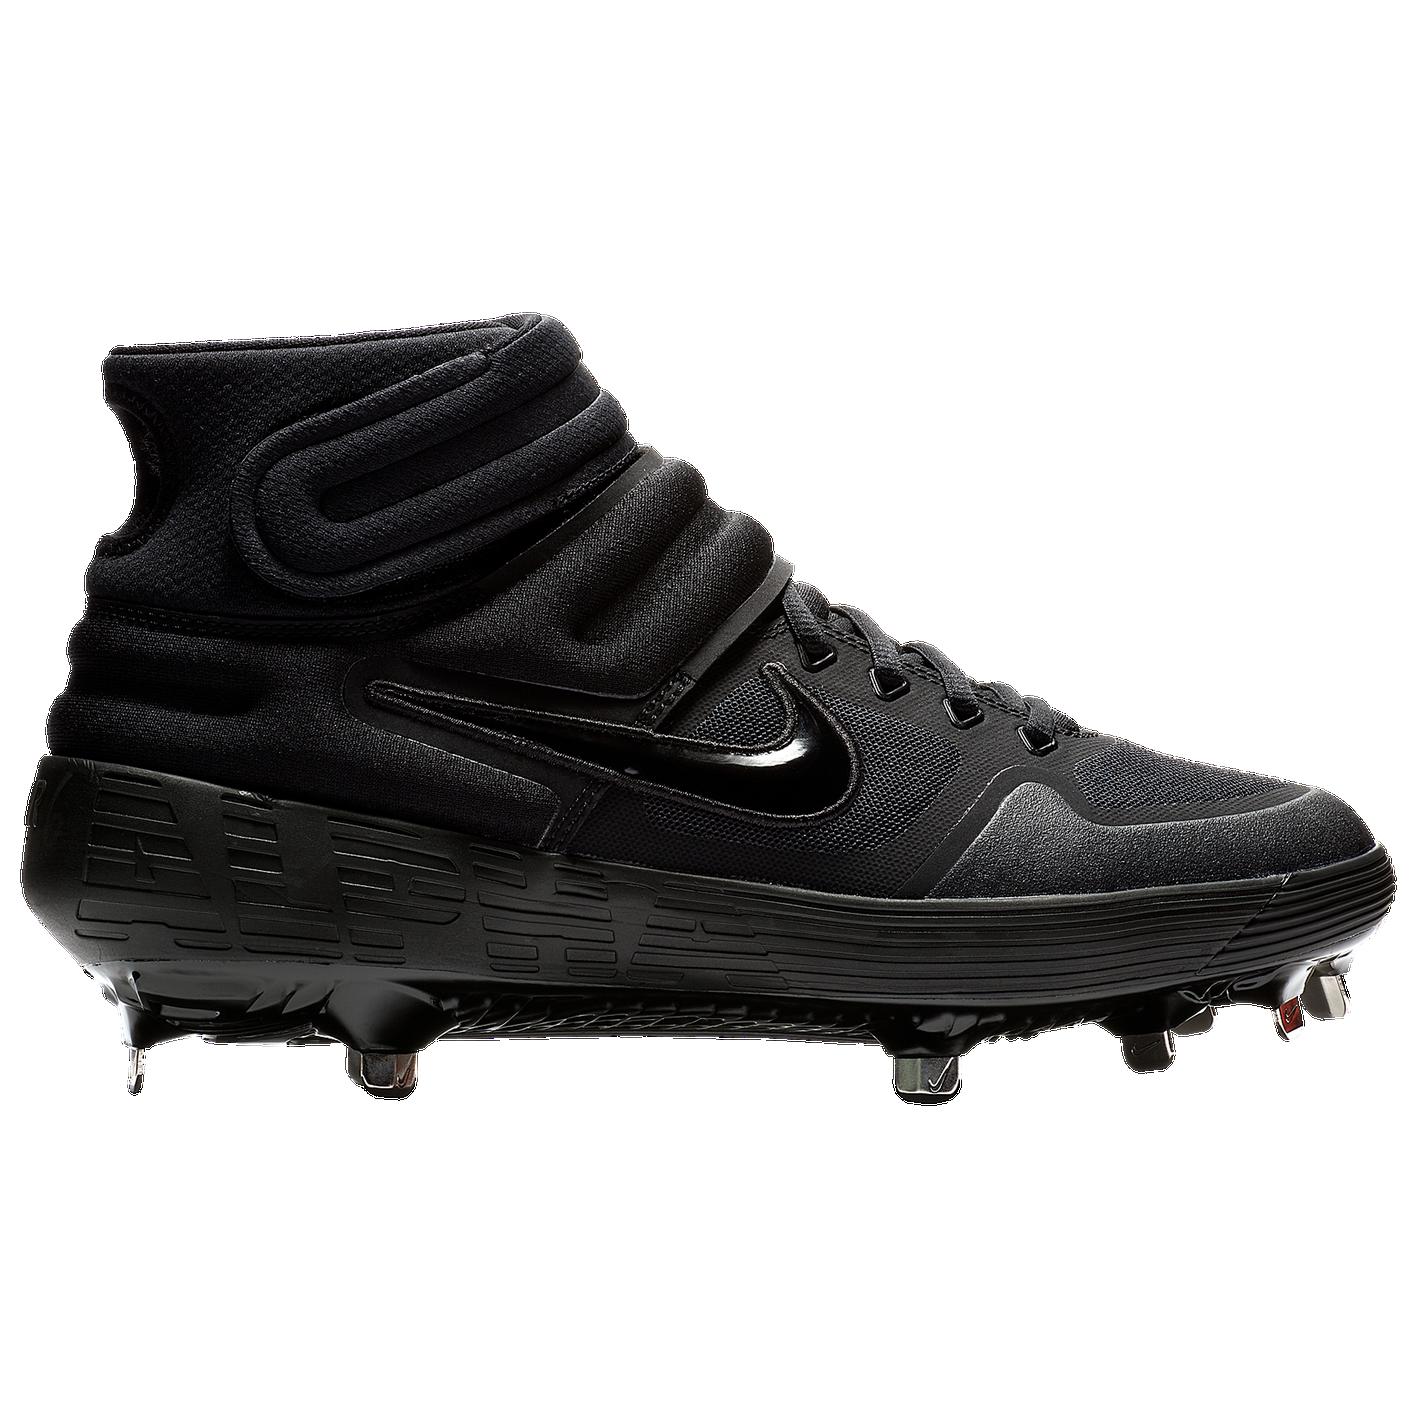 55dcac5e441 Nike Alpha Huarache Elite 2 Mid - Men s - Baseball - Shoes - Black ...